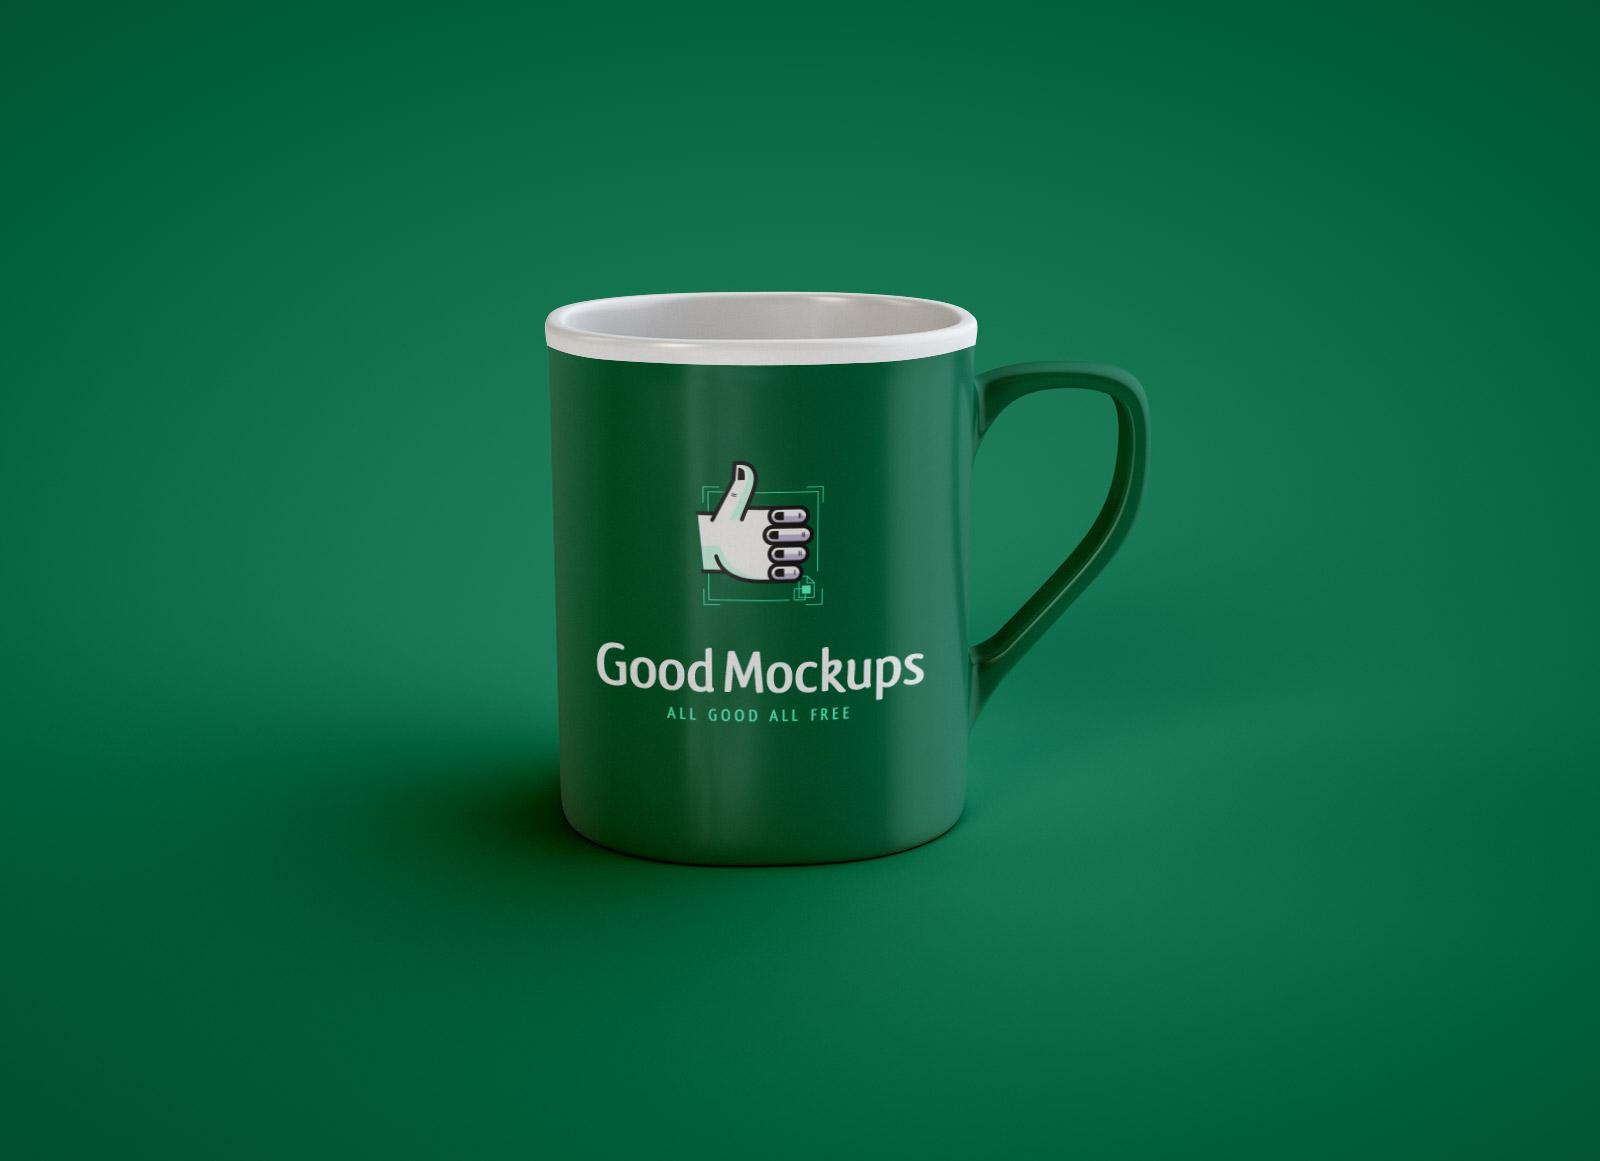 Free-Coffee-Mug-Mockup-PSD-2